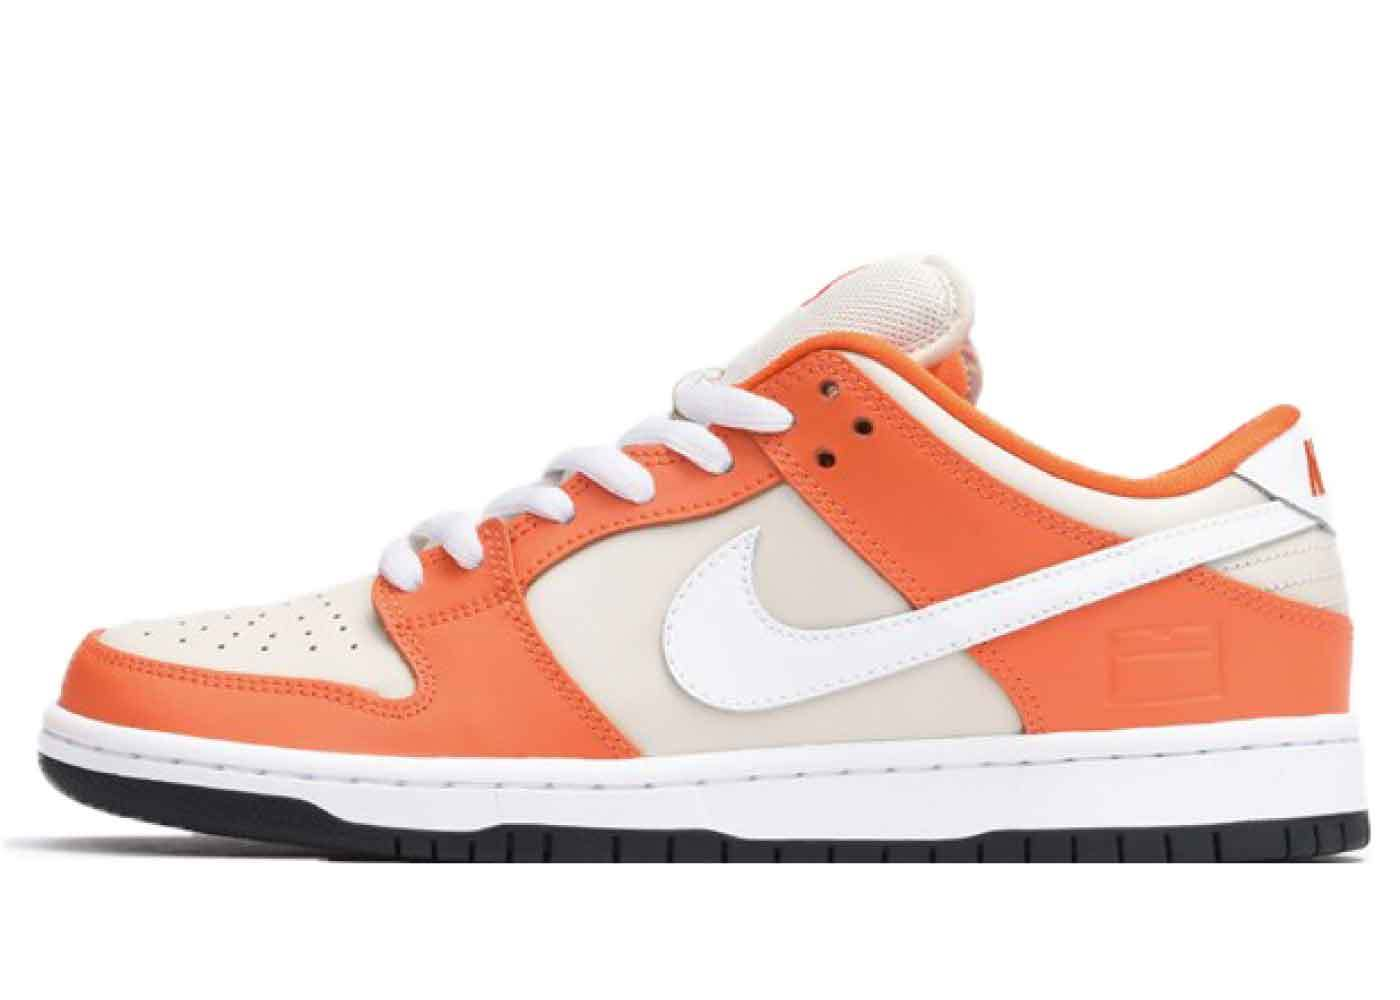 Nike SB Dunk Low Orange Boxの写真